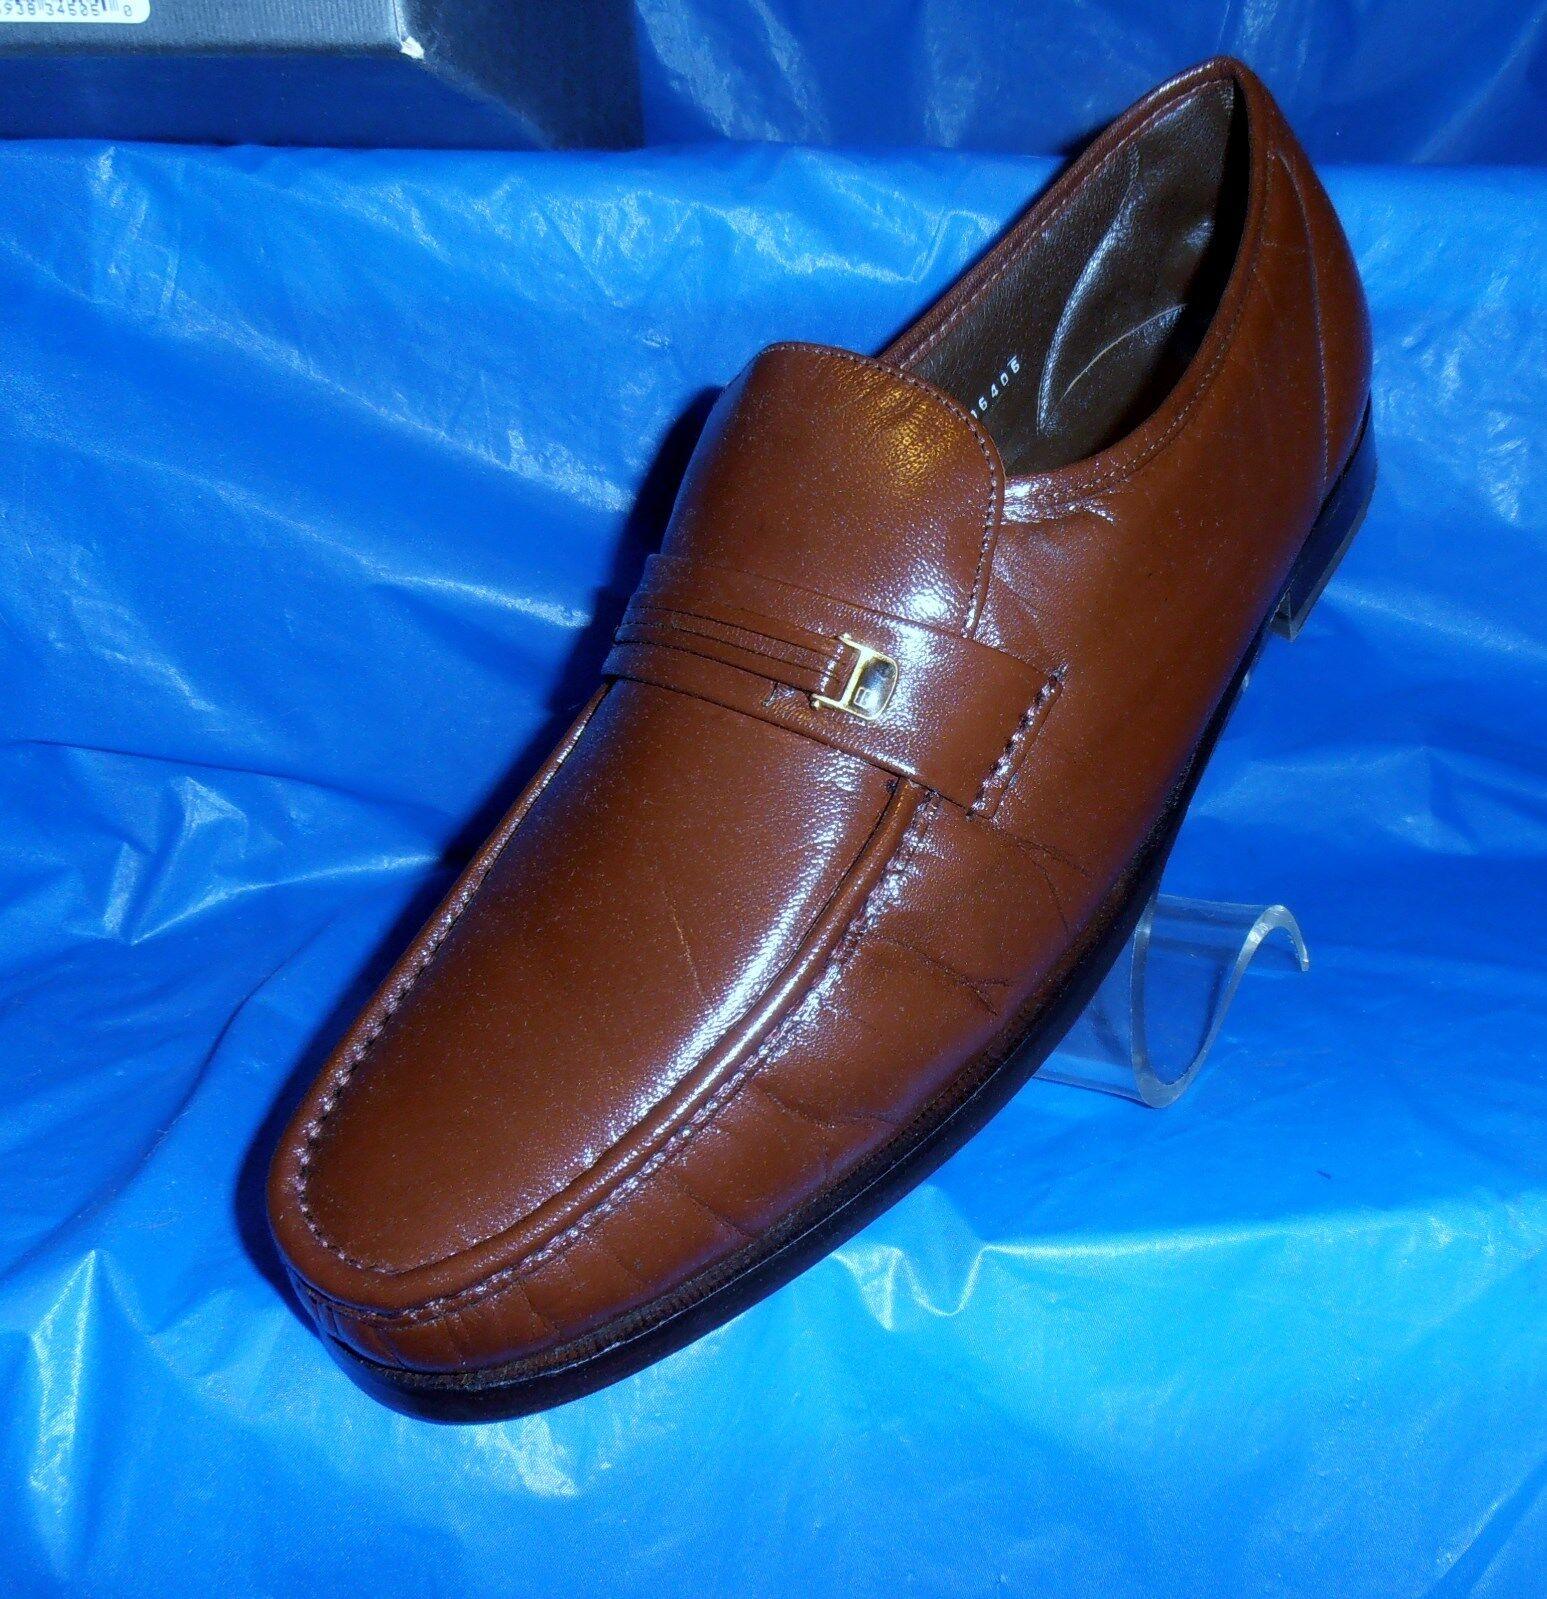 Florsheim Dancer  Cognac Brown Moc Toe Leather Loafer with Leather Sole 13 D Scarpe classiche da uomo